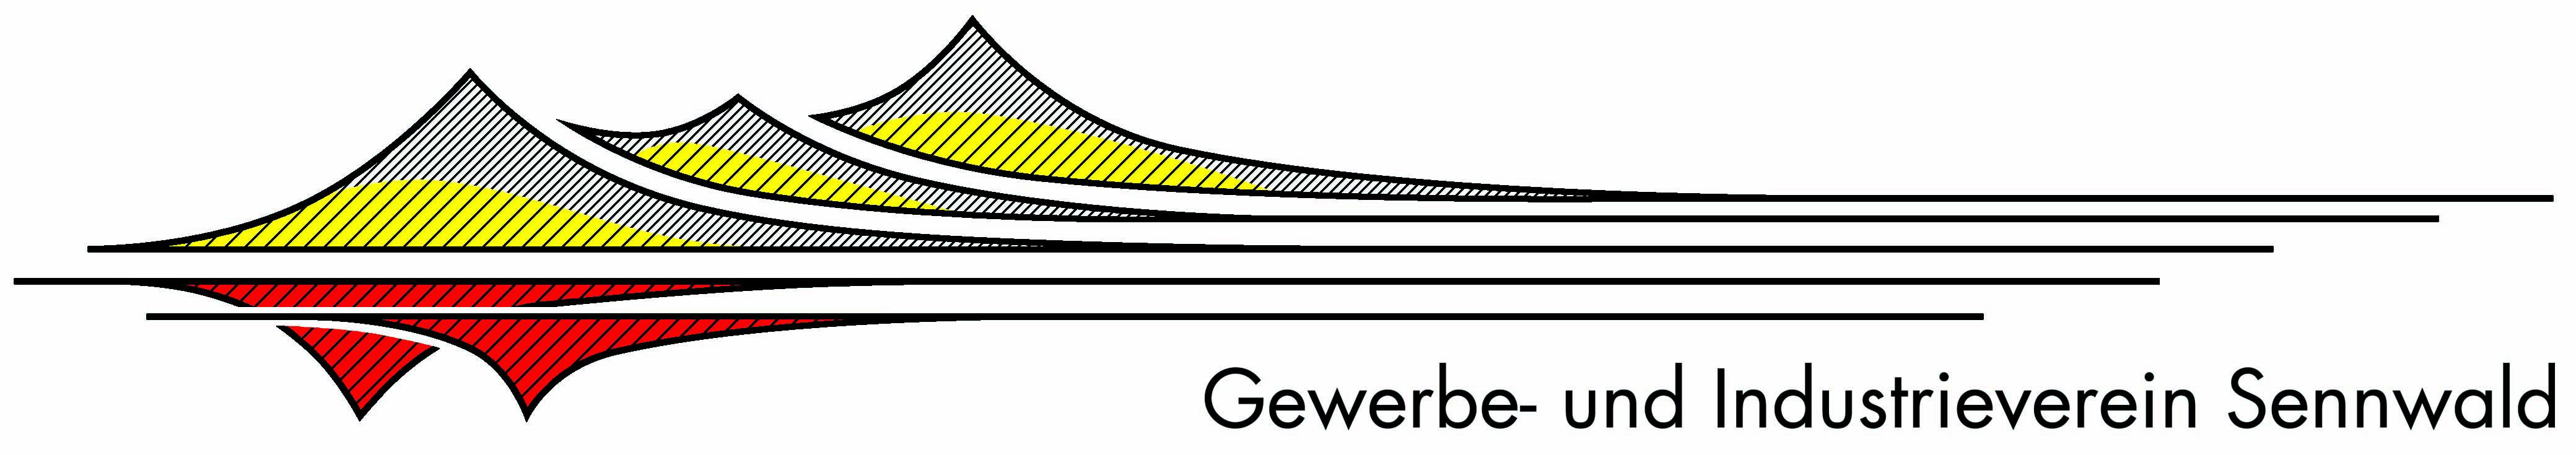 Logo GIV Sennwald